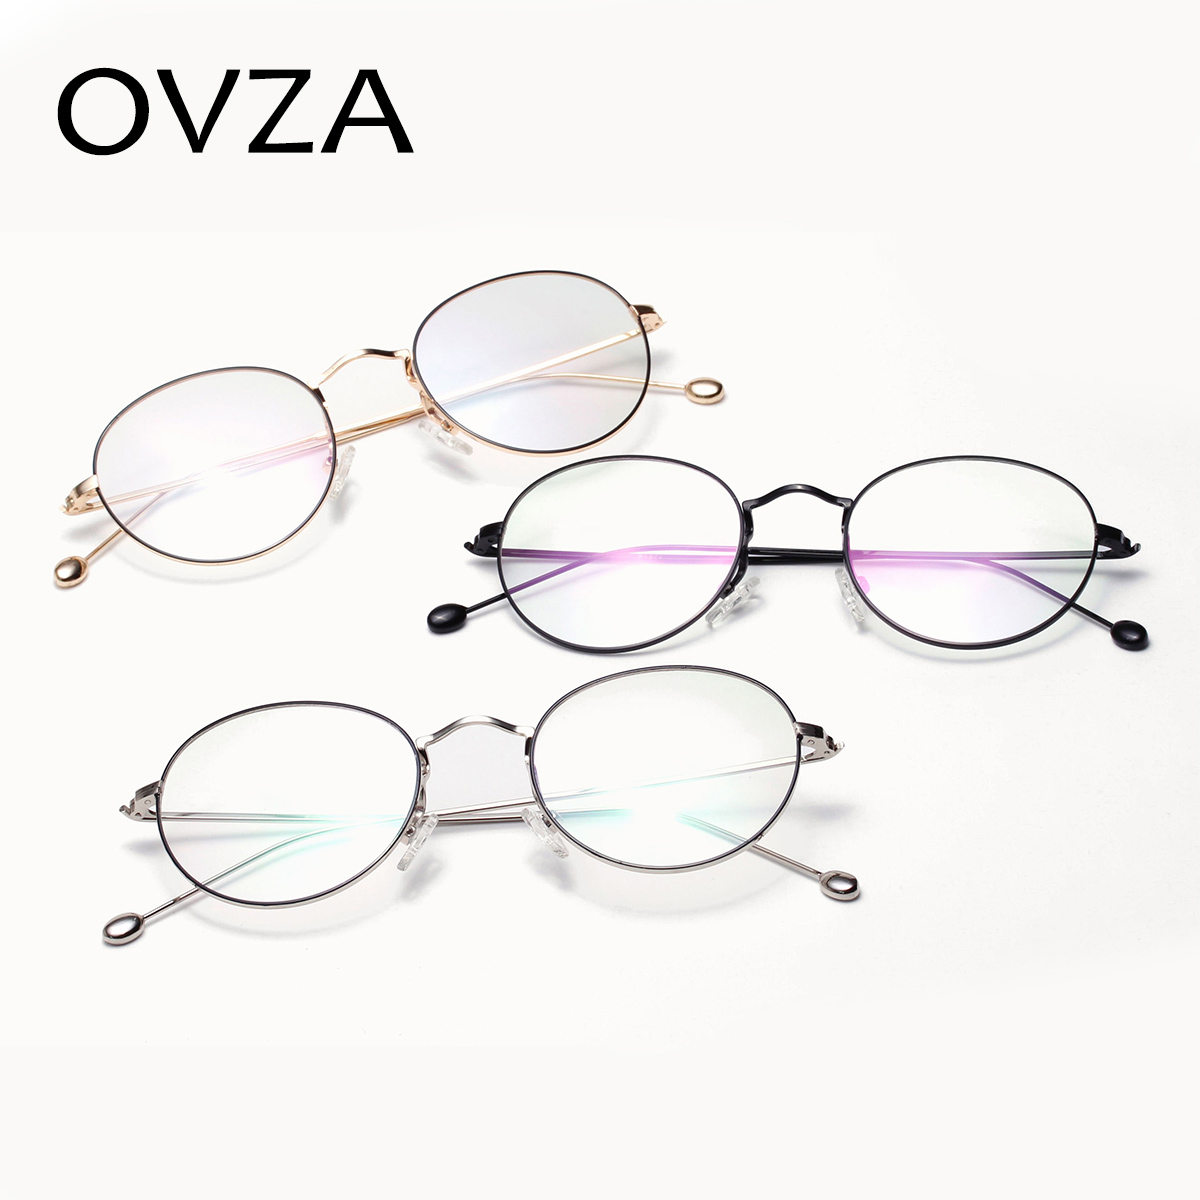 1278c7335b9 OVZA Vintage Oval Glasses Frames Women Fashion Metal Optical Frame Mens  Retro Eyeglasses Ultralight Transparent L S1093-in Eyewear Frames from  Men s ...